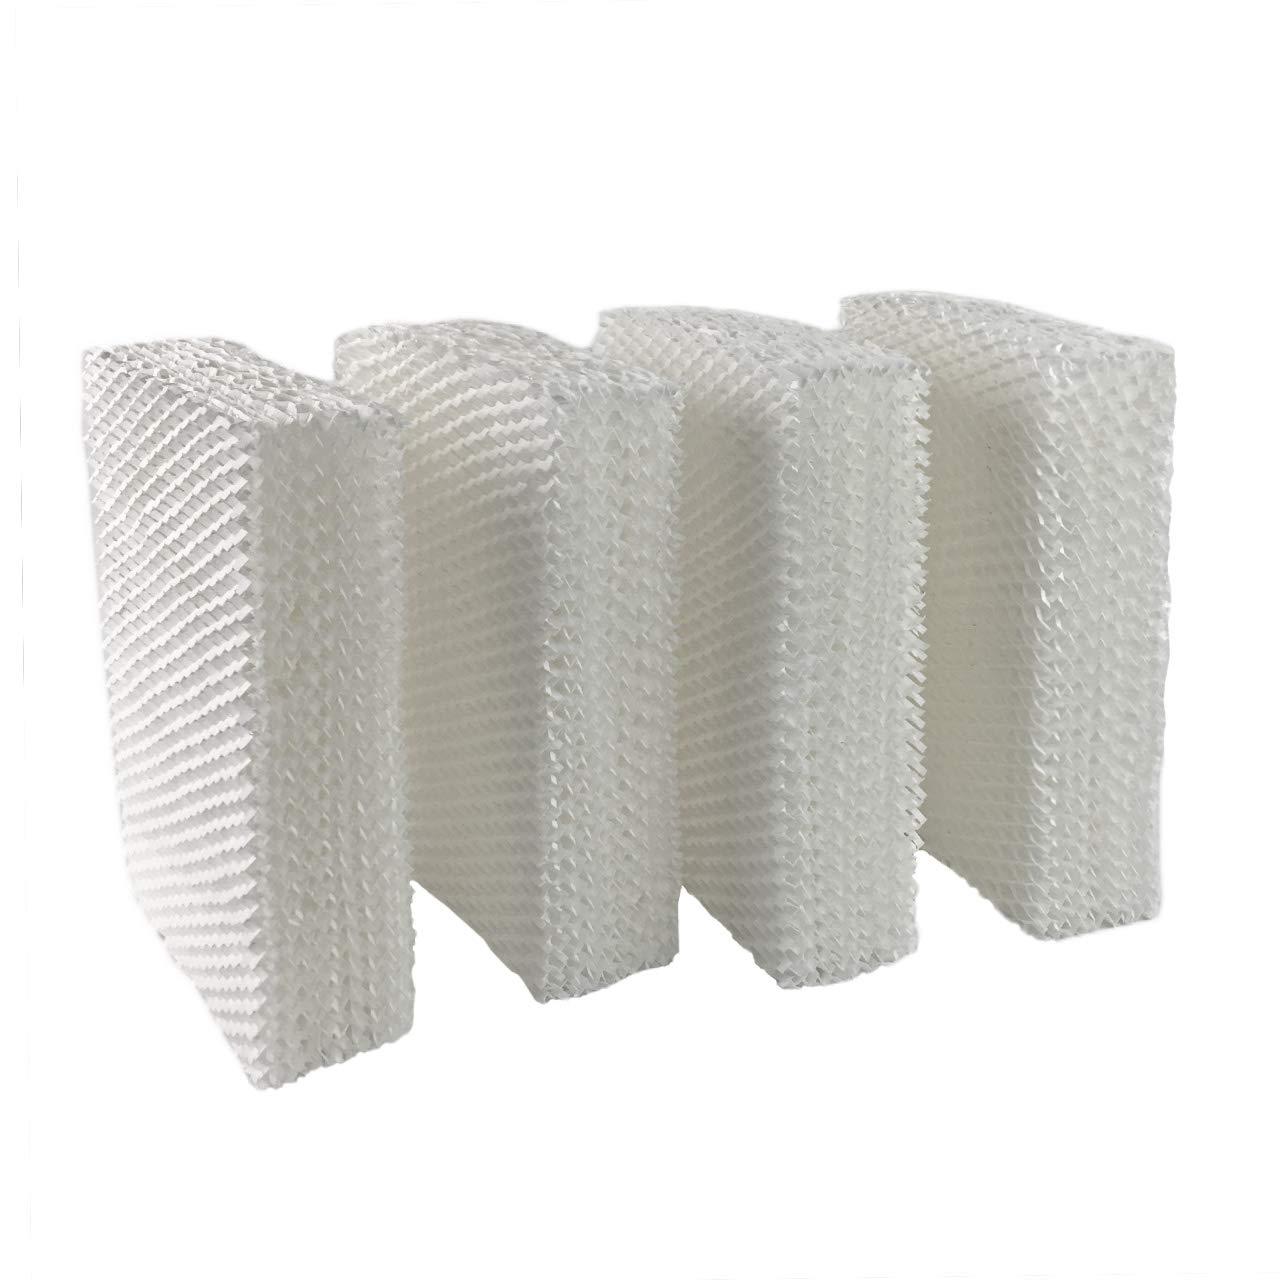 Eagleggo 4 Pack, HDC-12 & 14911 Humidifier Wick Filter, fits Kenmore & Emerson Models HD1100, 1102, 1200, 1202, 1204, 1212, 1300, 1409 & 14452, 14453, EA1407 by Eagleggo